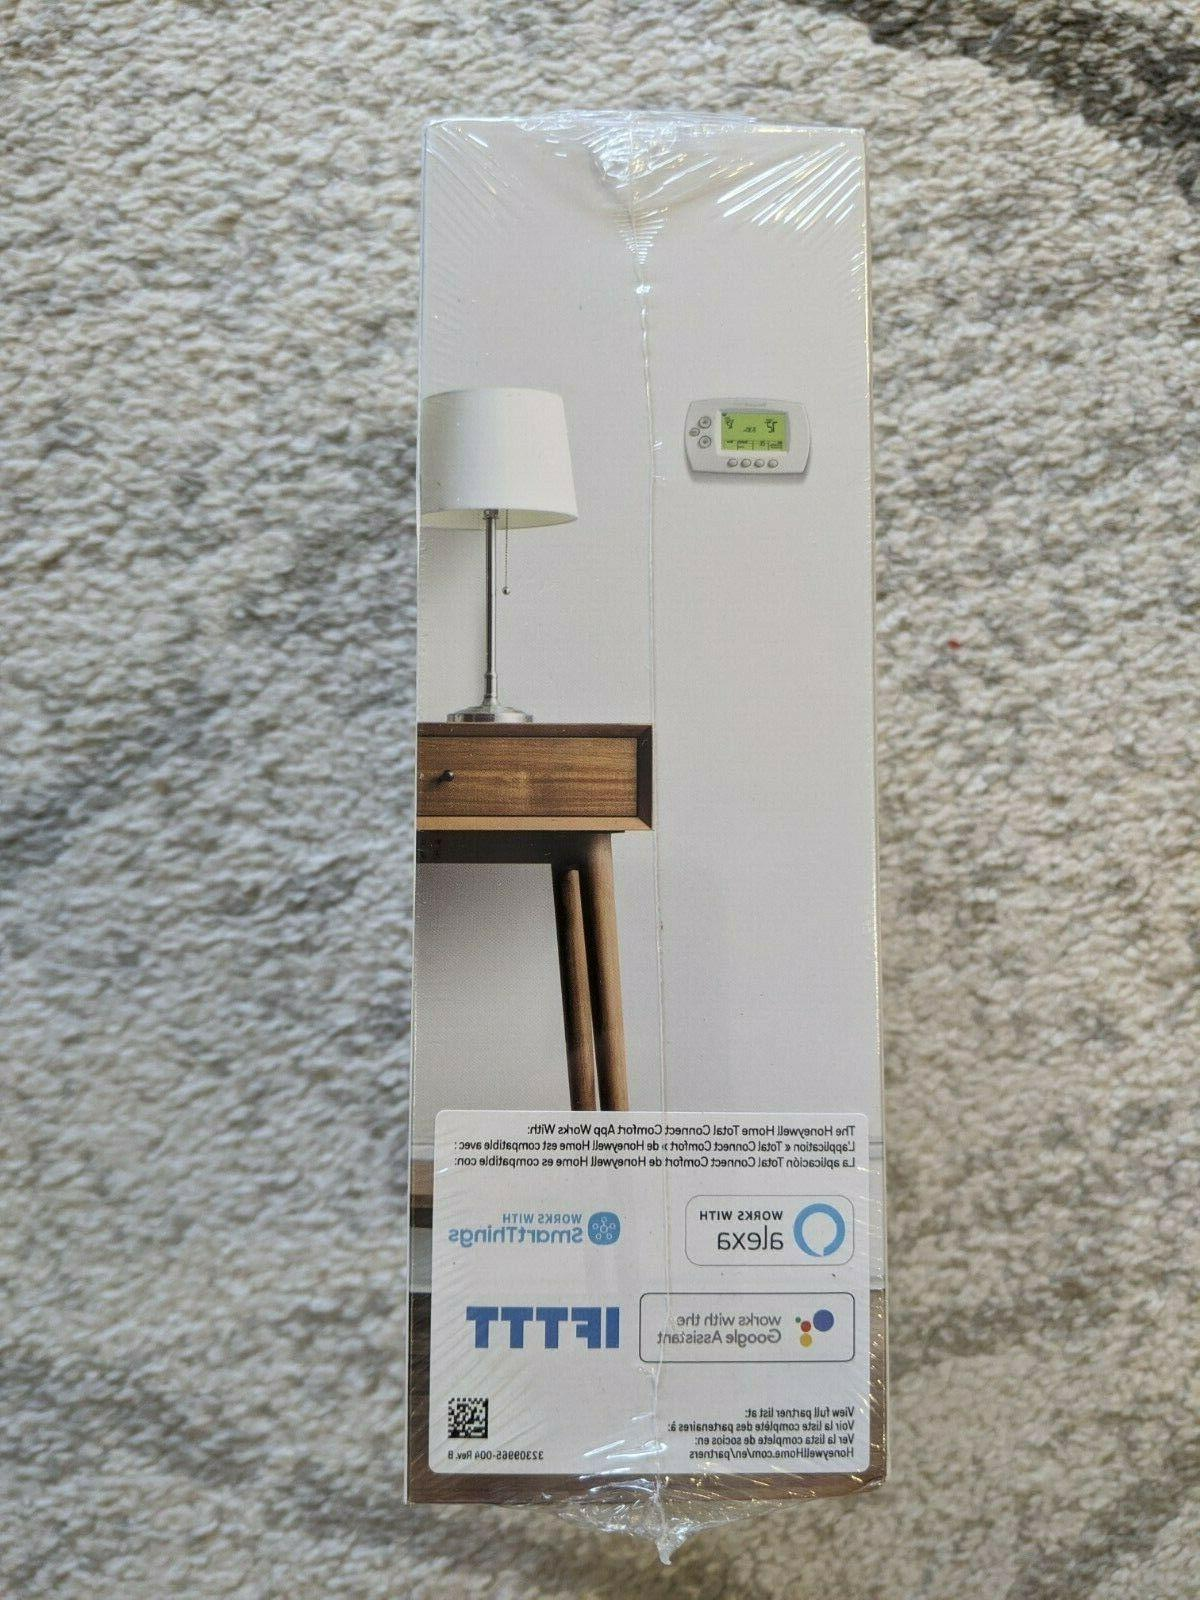 Honeywell Home Wi-Fi